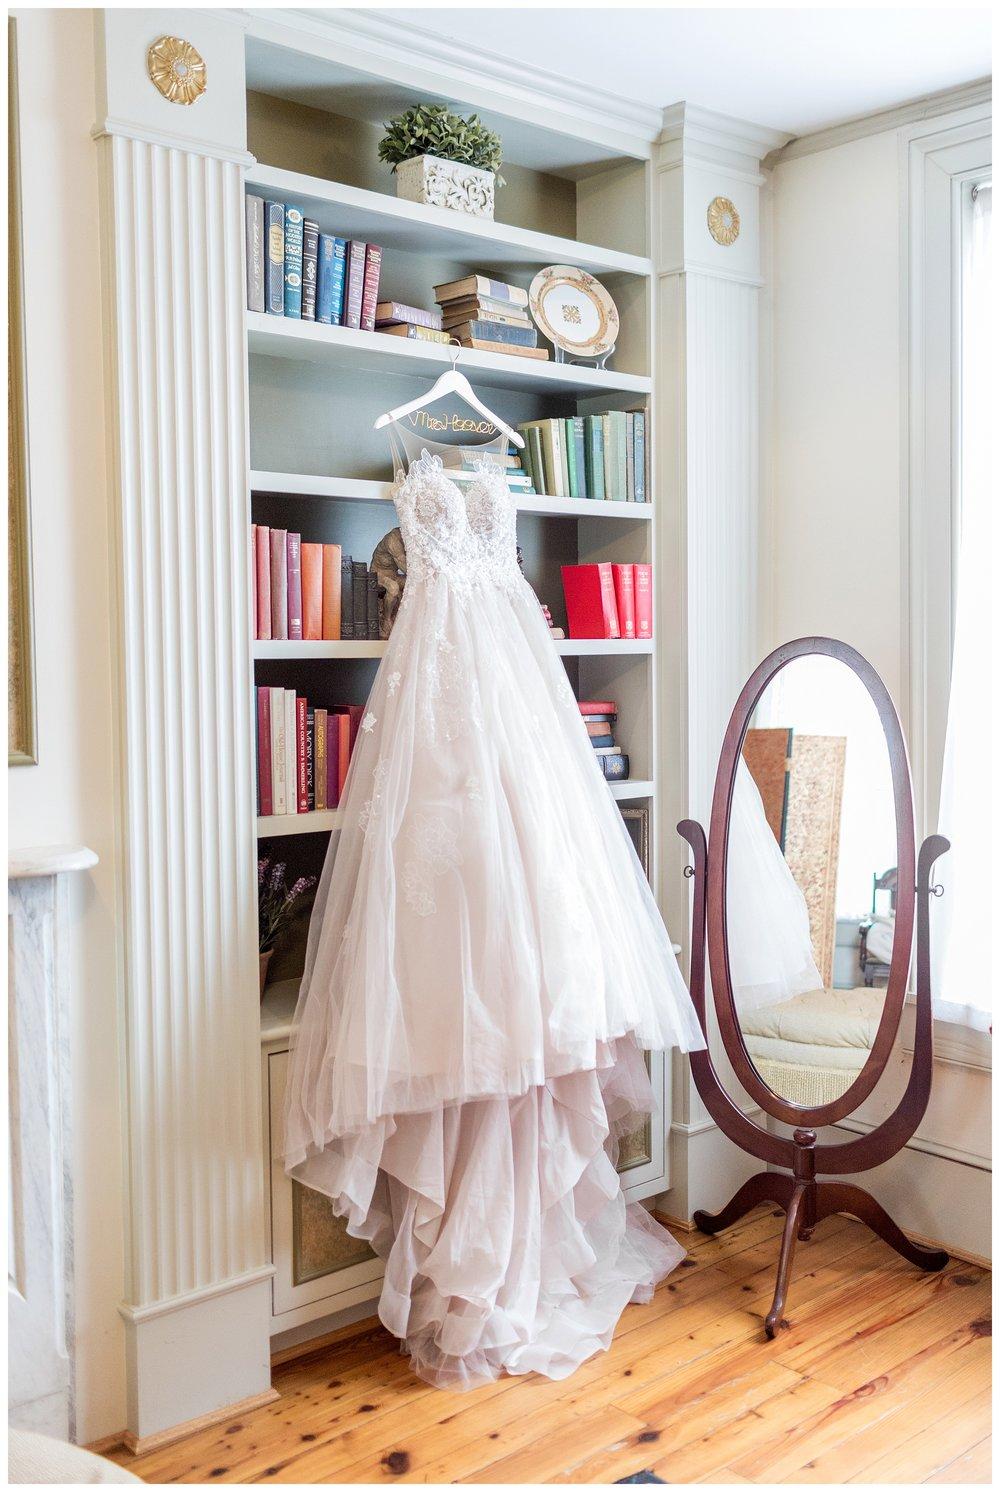 Whitehall Estate Wedding | Northern Virginia Wedding Photographer Kir Tuben_0012.jpg